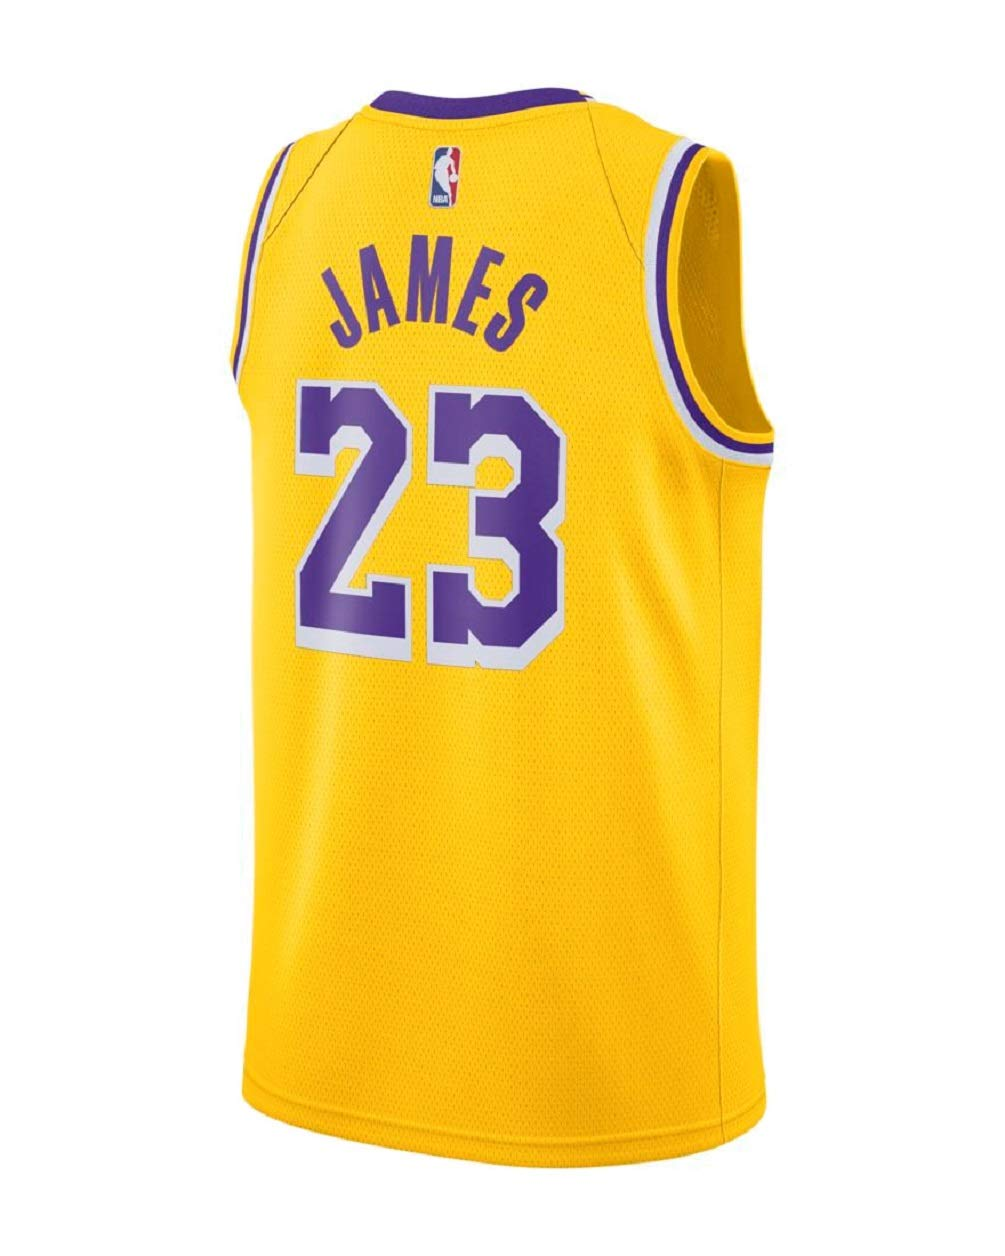 Amazon.com : Nike Mens Los Angeles Lakers Lebron James 2018-19 Icon Edition Swingman Jersey : Sports & Outdoors